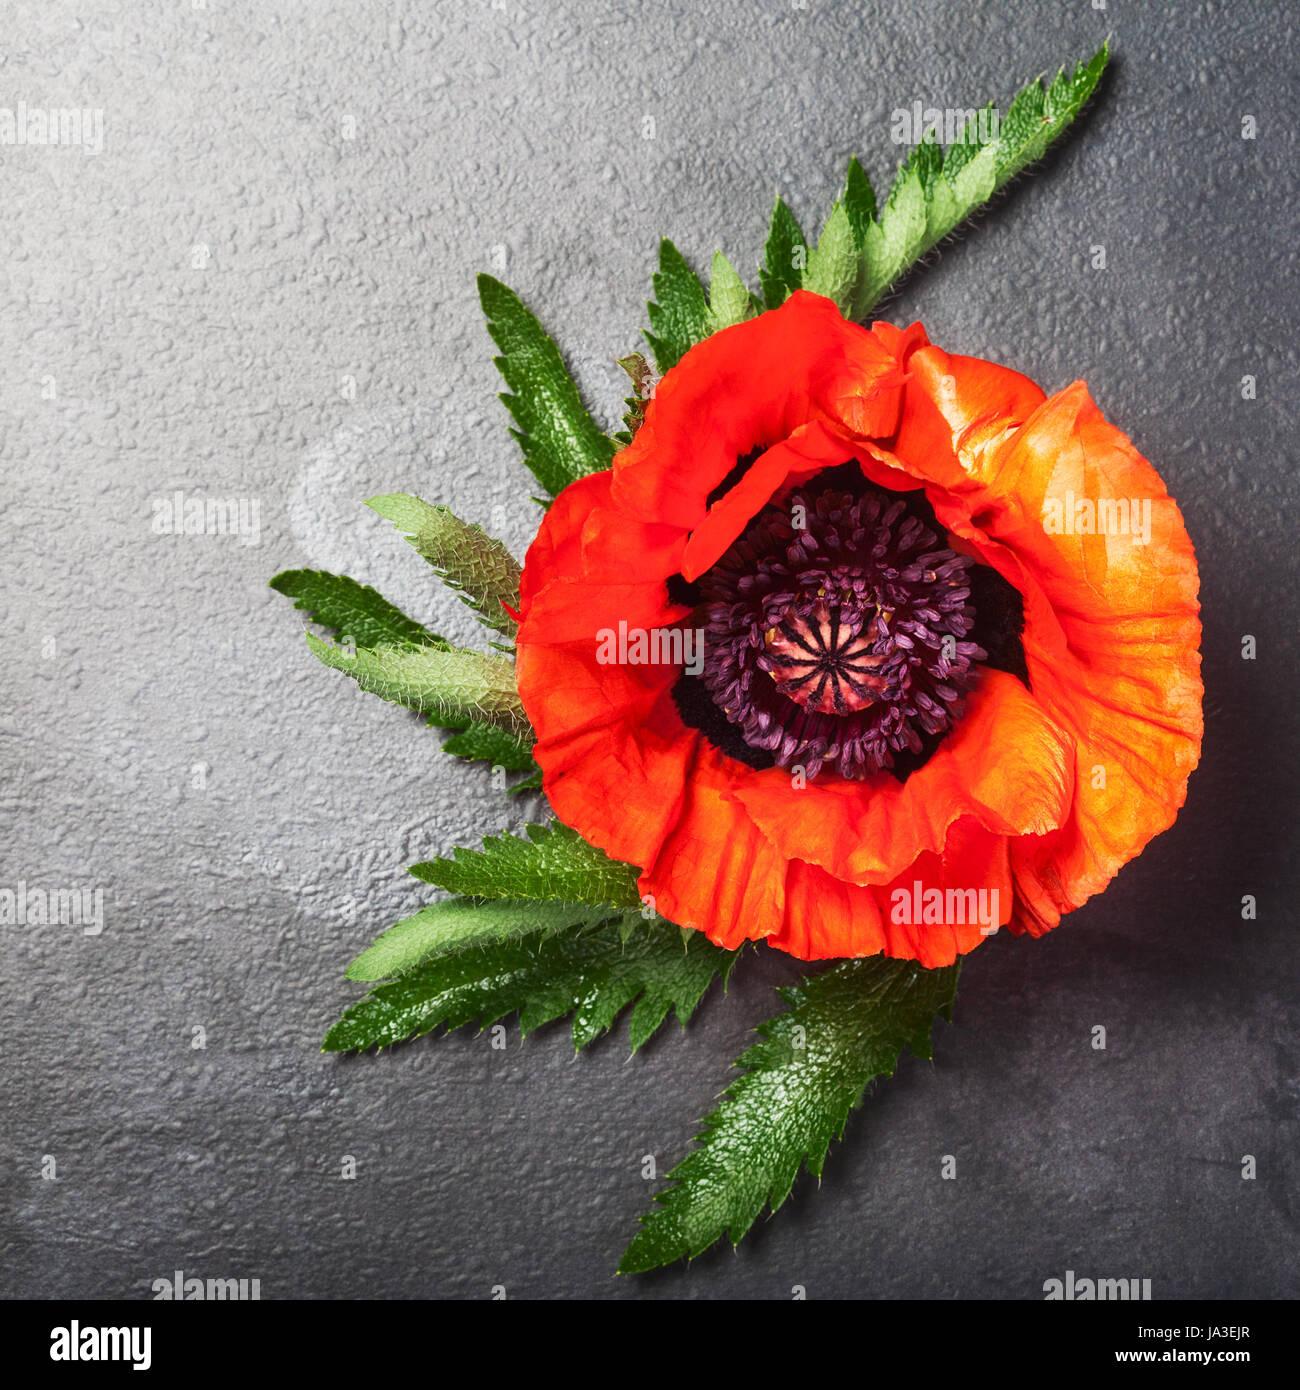 Red poppy flower with leaves on dark background summer garden stock red poppy flower with leaves on dark background summer garden flowers top view copy space mightylinksfo